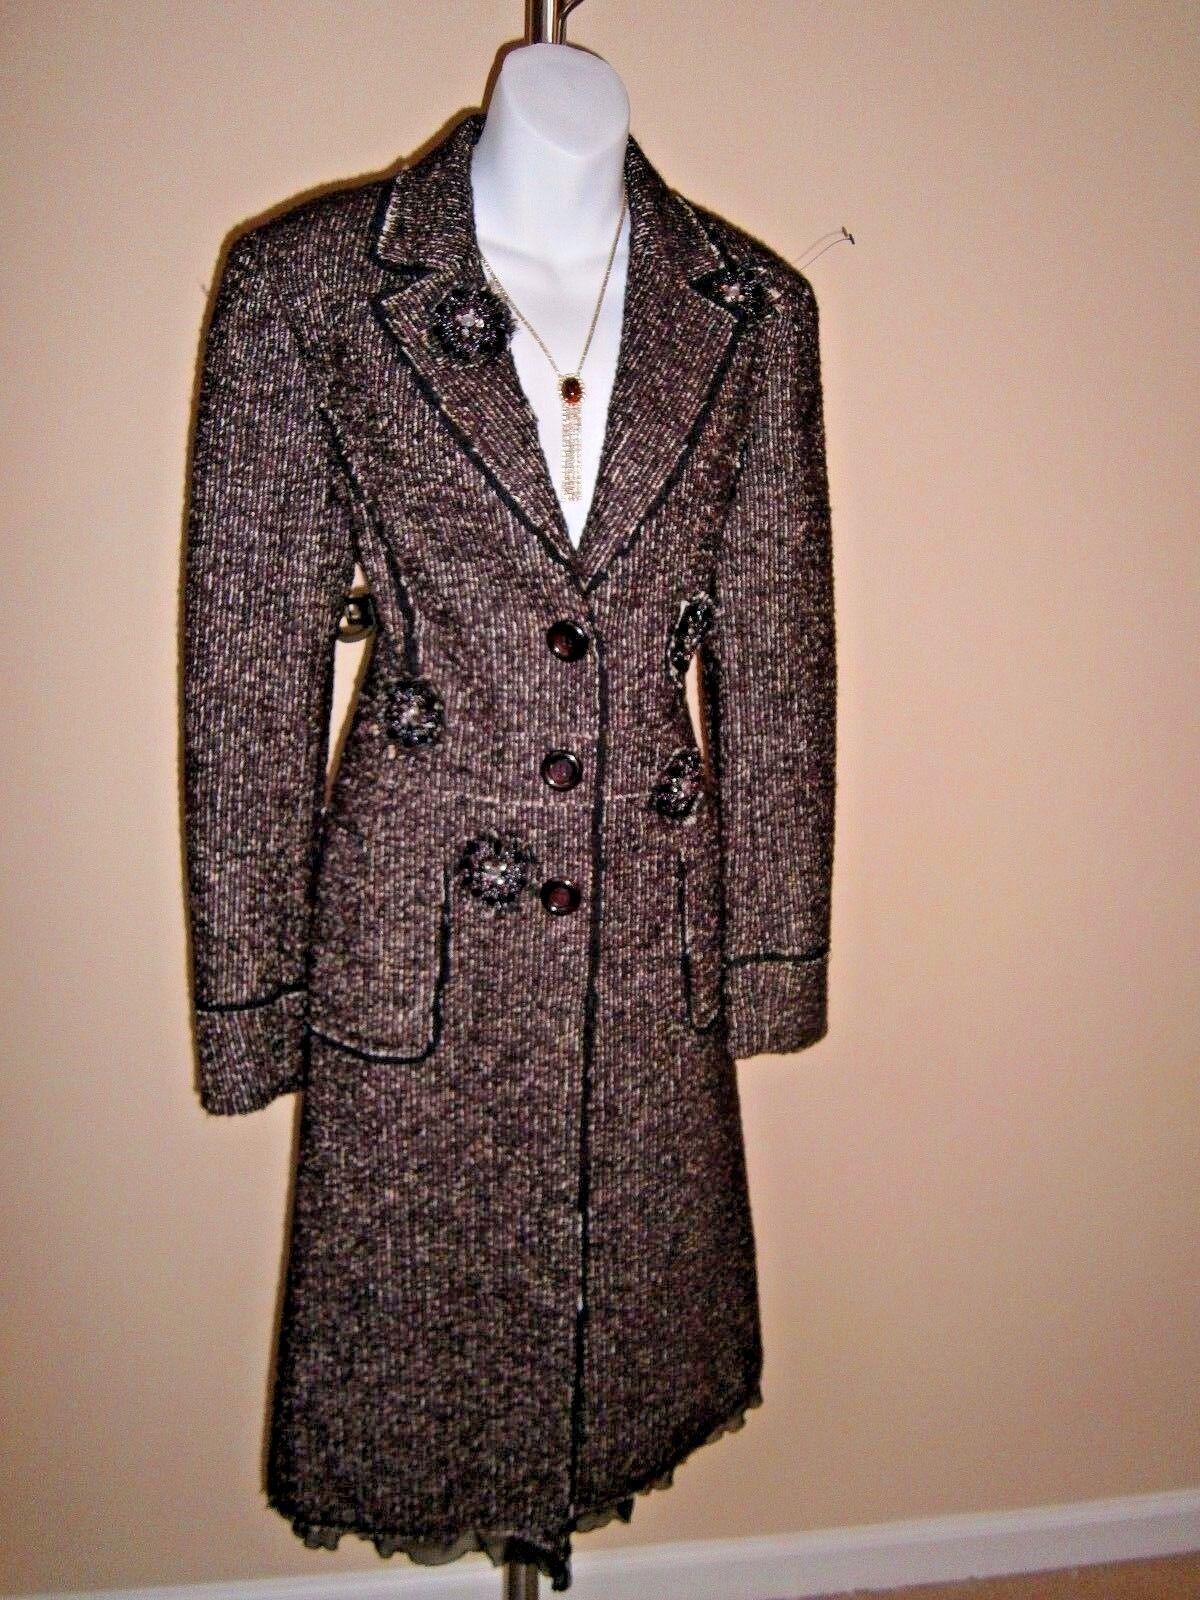 Lafayette 148 New York Brown Multi-color Alpaca Blend Tweed Embellished Coat Sz6